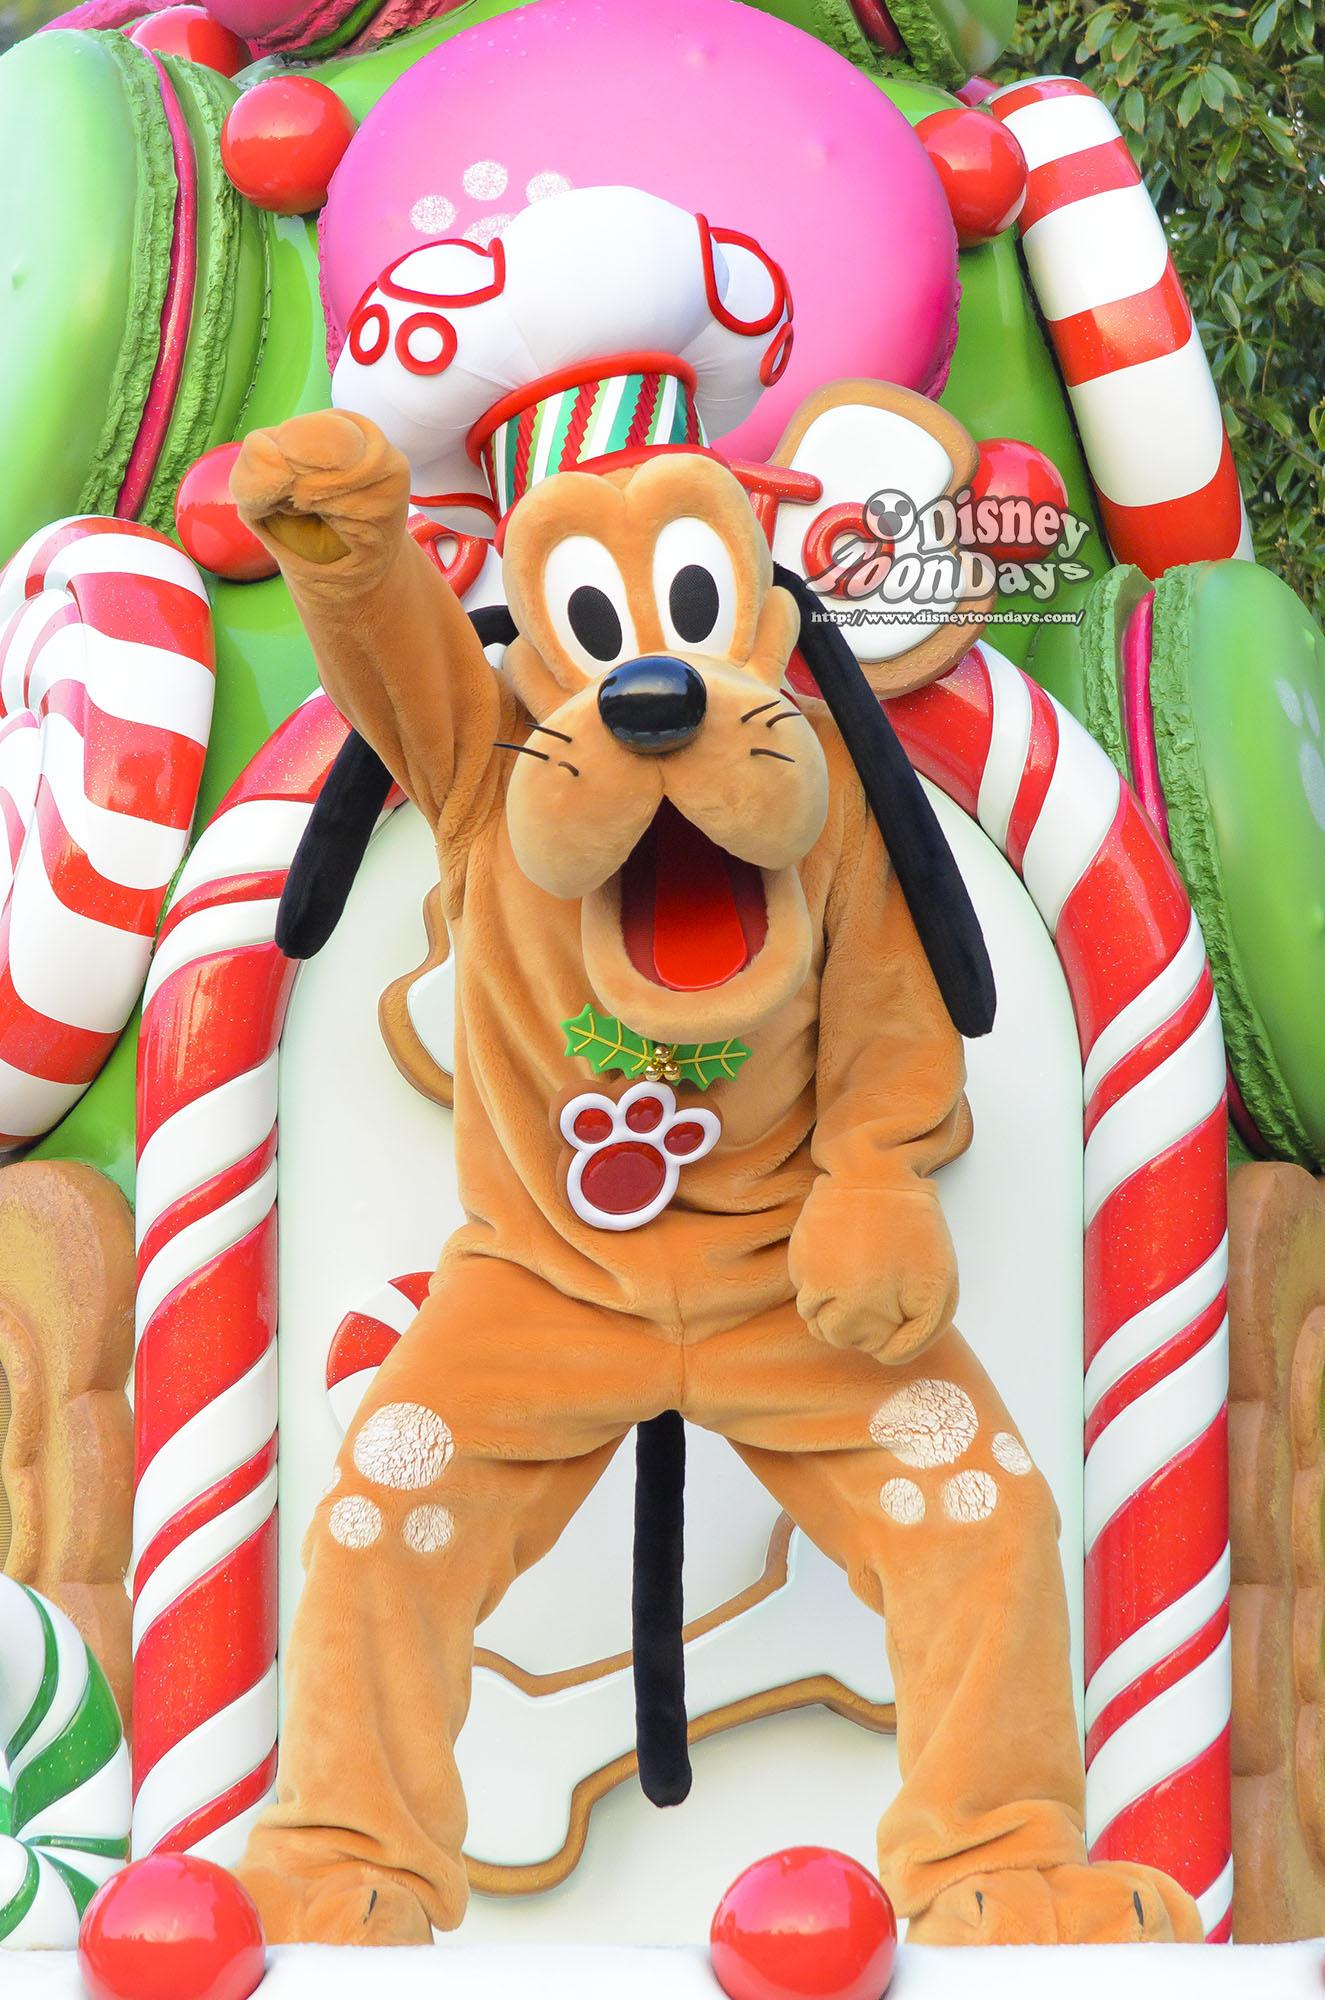 TDL クリスマス・ファンタジー 2013 ディズニー・サンタヴィレッジ・パレード プルート